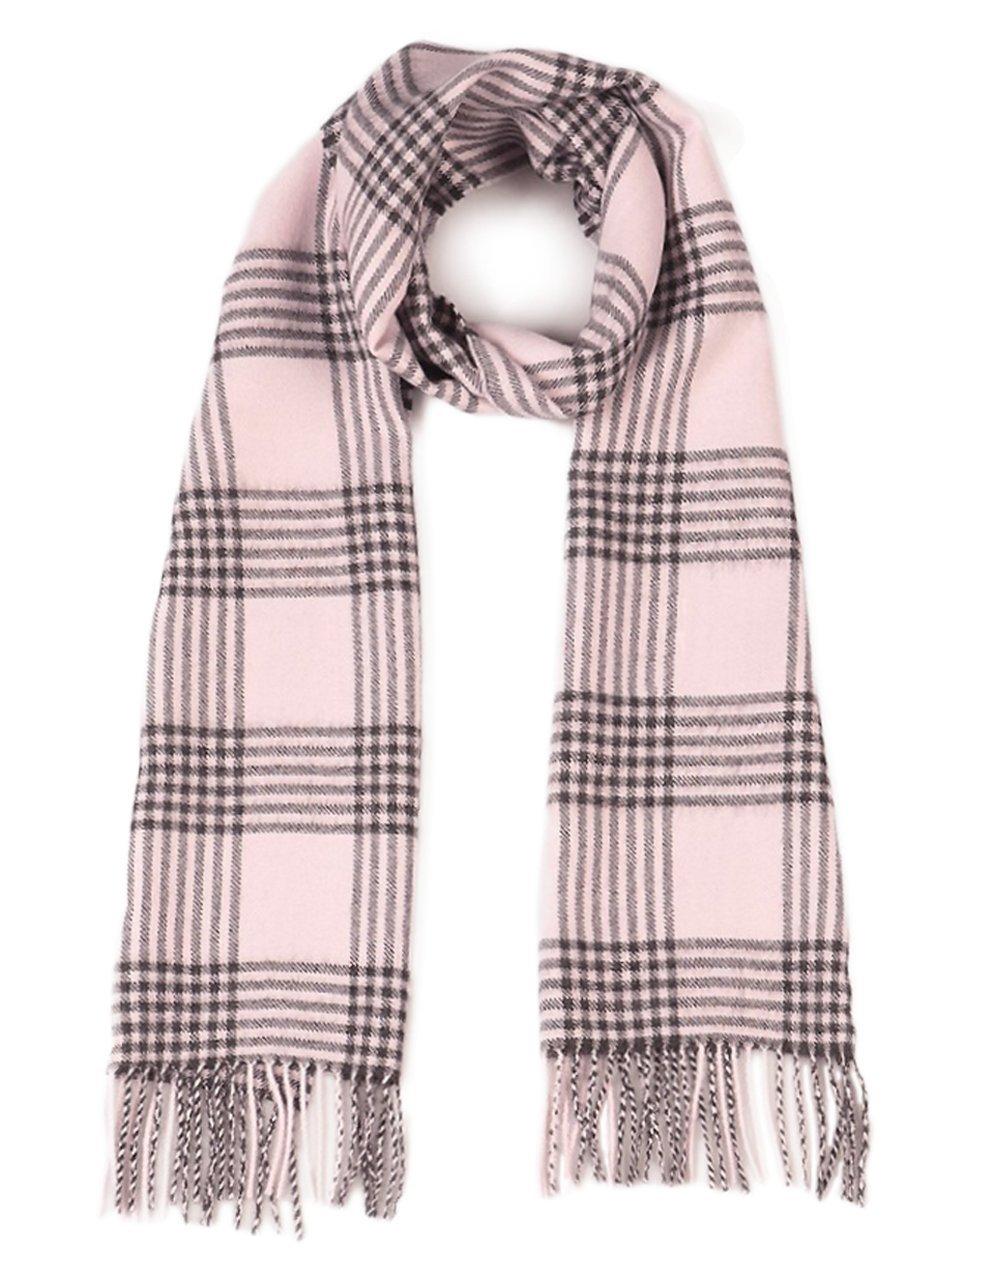 Cross Hatch Plaid Scarf 100% Pure Baby Alpaca - Unequaled Luxury for Men & Women (Blush / Grey)